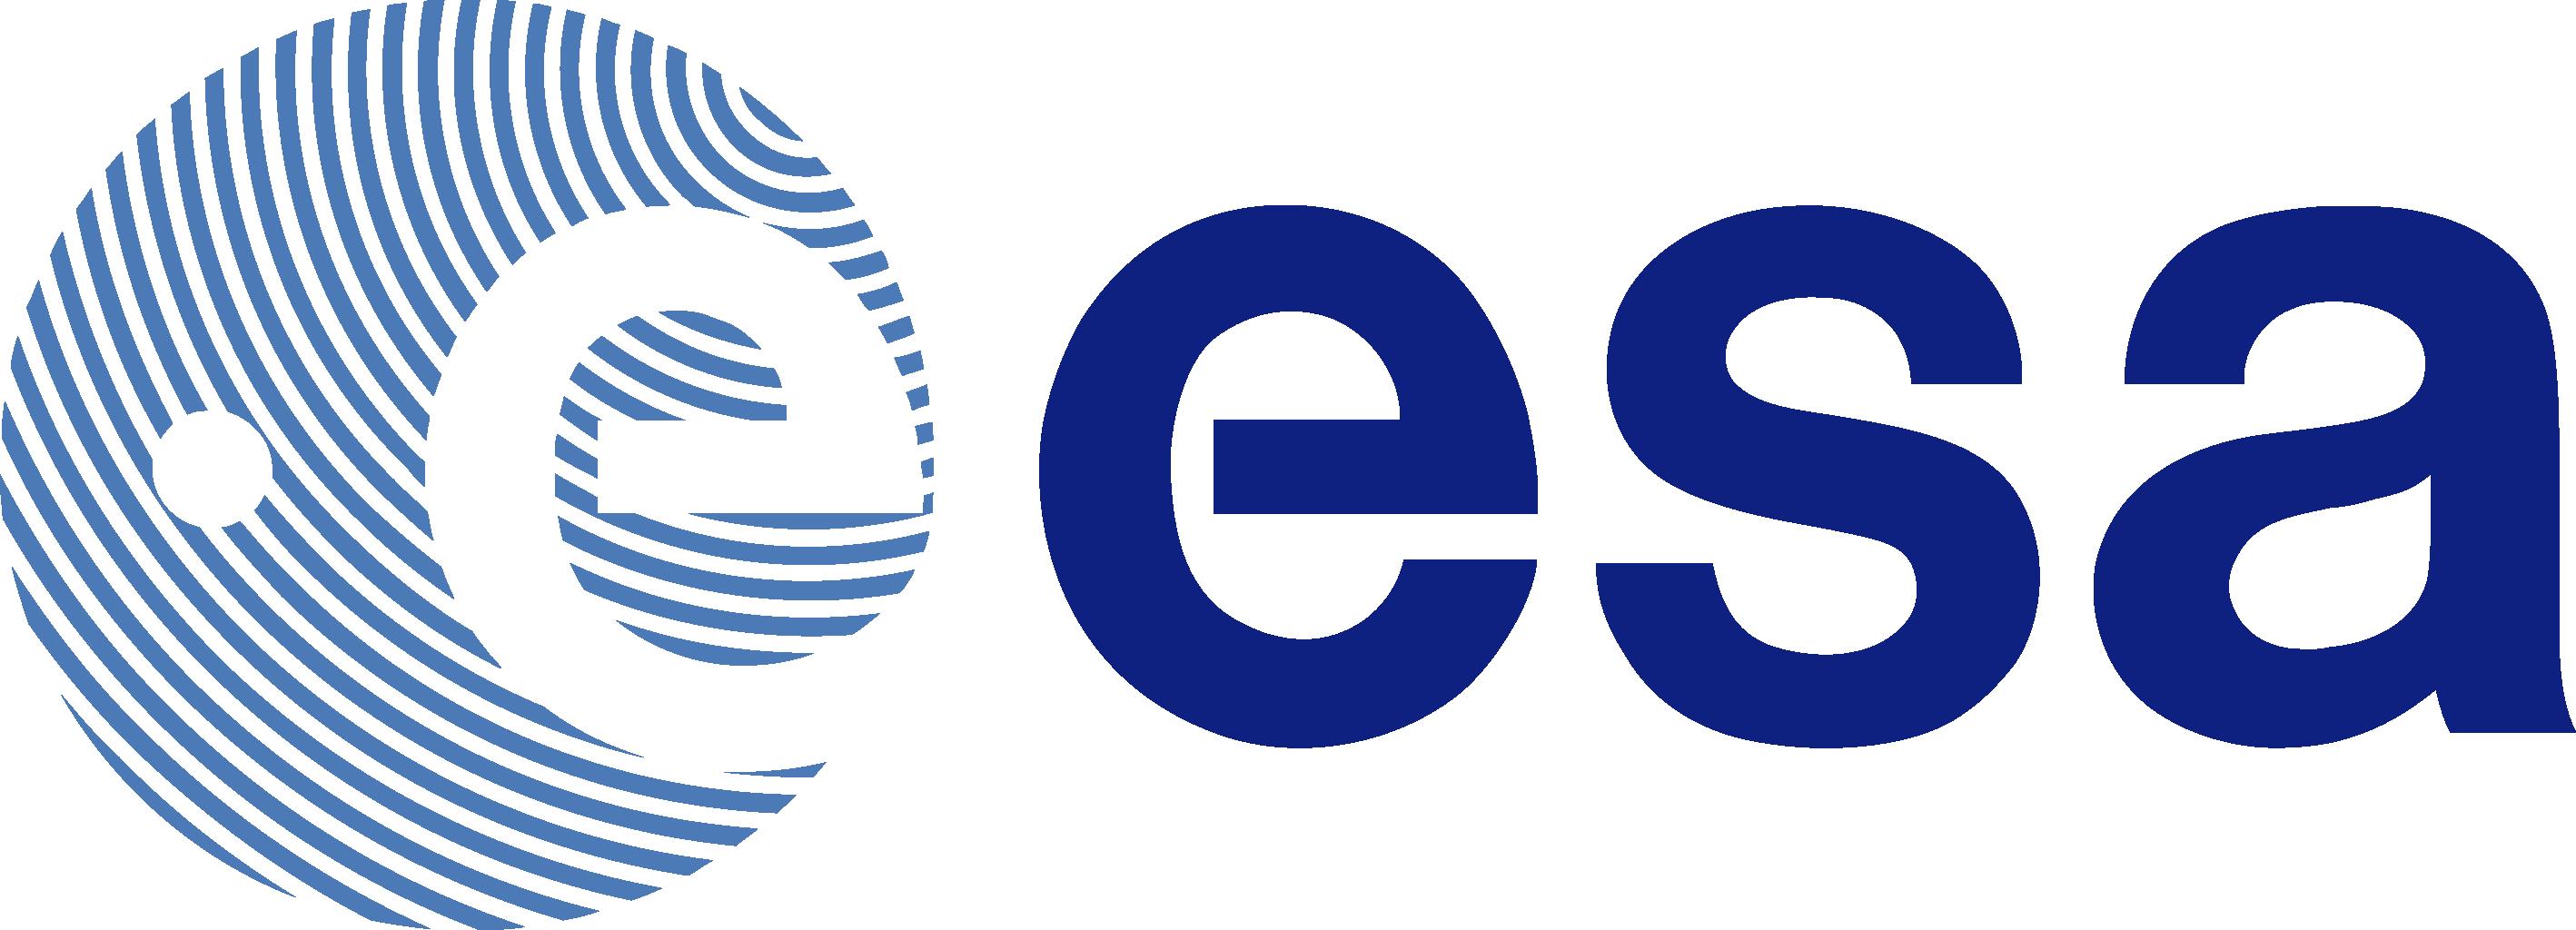 Esa European Space Agency Logo Logos Best Logo Design Picture Logo